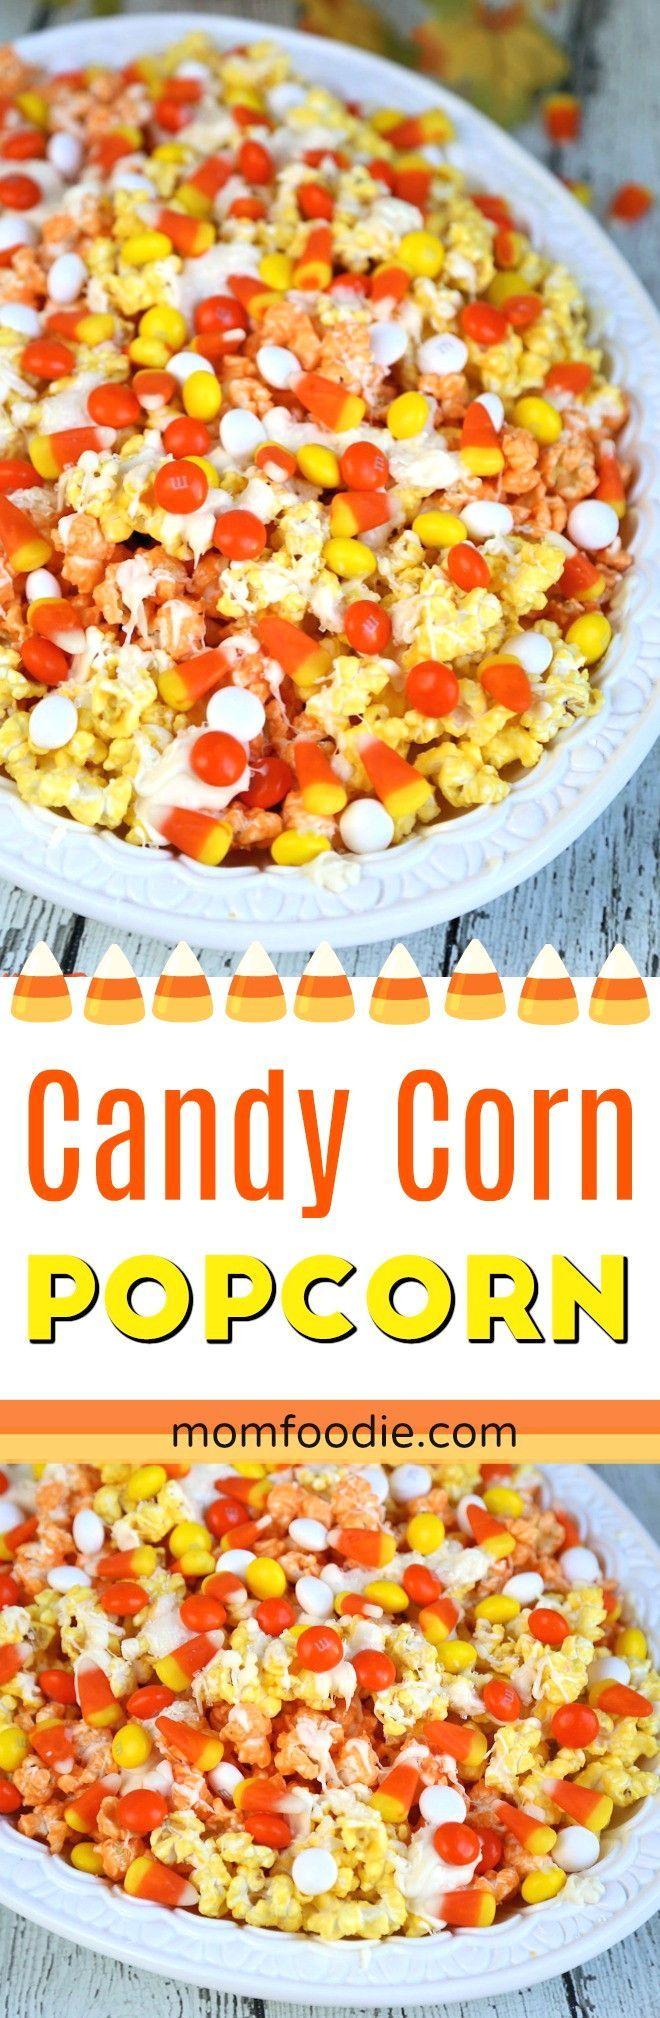 Candy Corn Popcorn recipe - Fall Snack Mix : Halloween food, Thanksgiving snacks #HalloweenFood #Thanksgiving